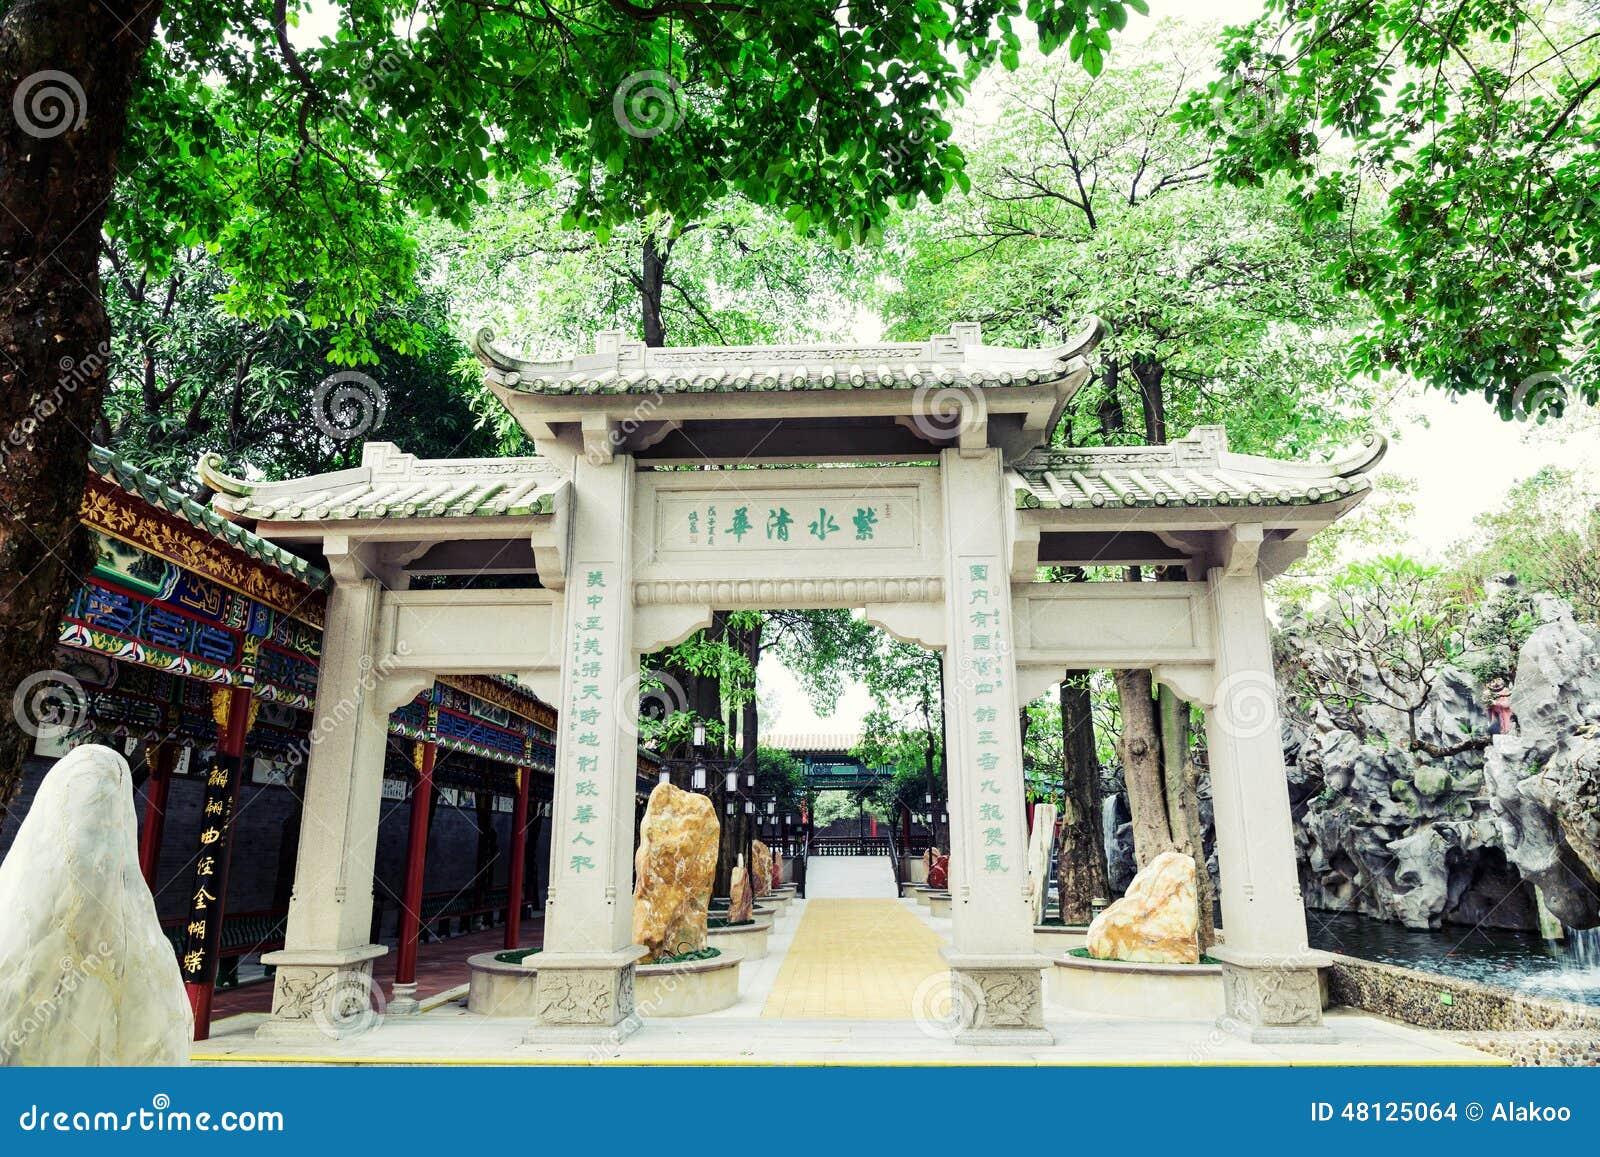 Archway In Chinese Garden China Stock PhotoImage 48125064